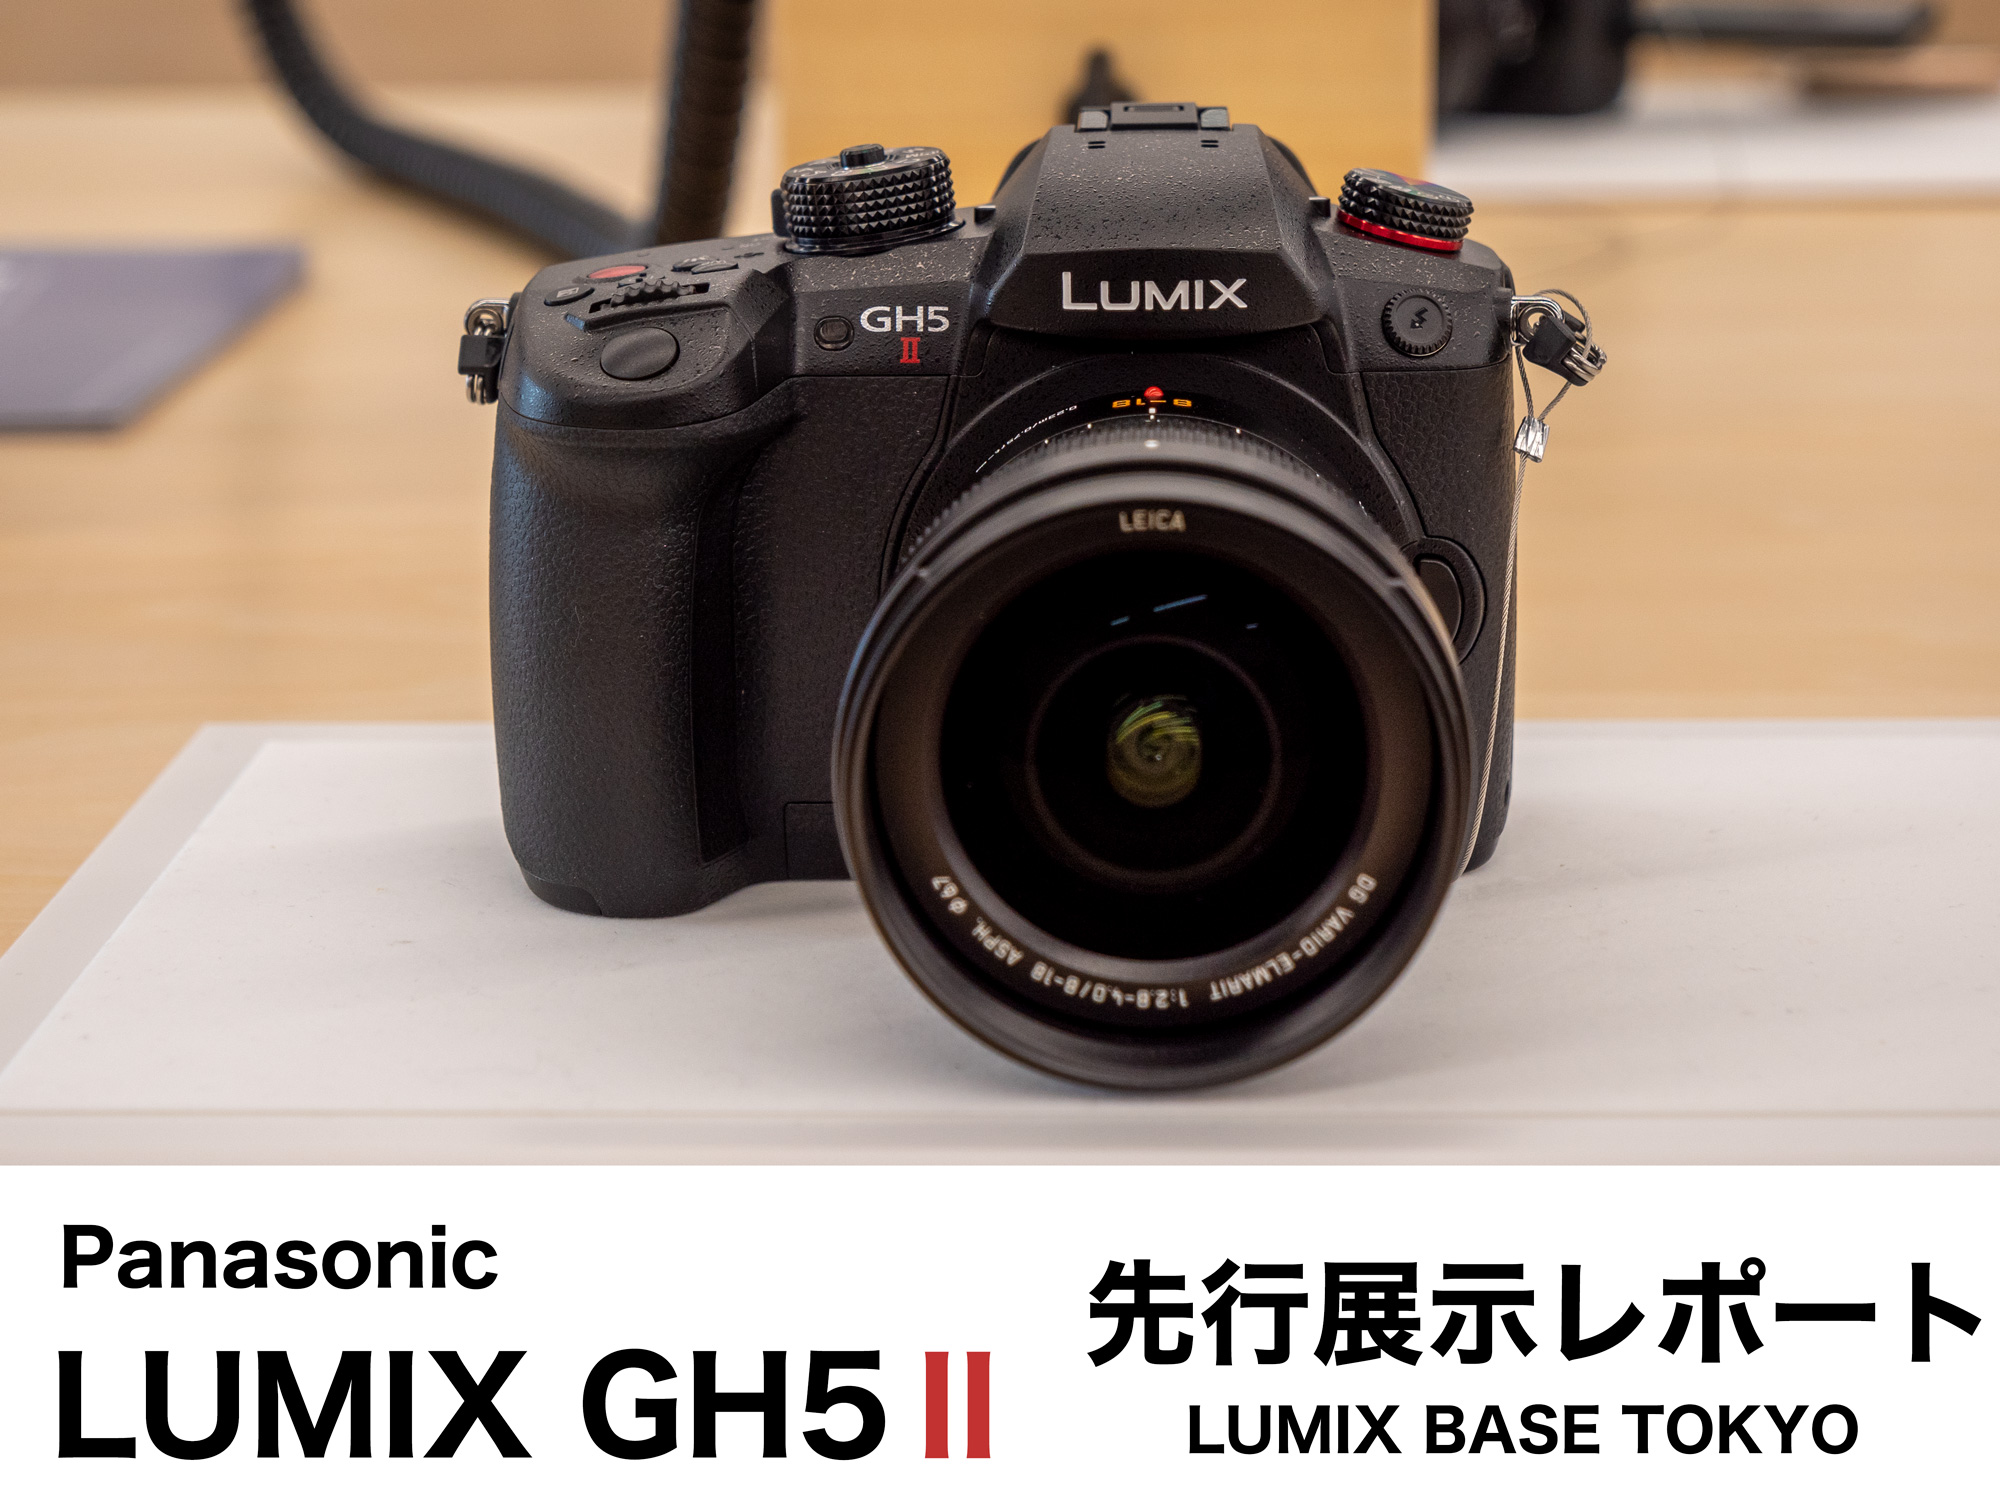 【Panasonic】『LUMIX GH5II』 先行展示レポート